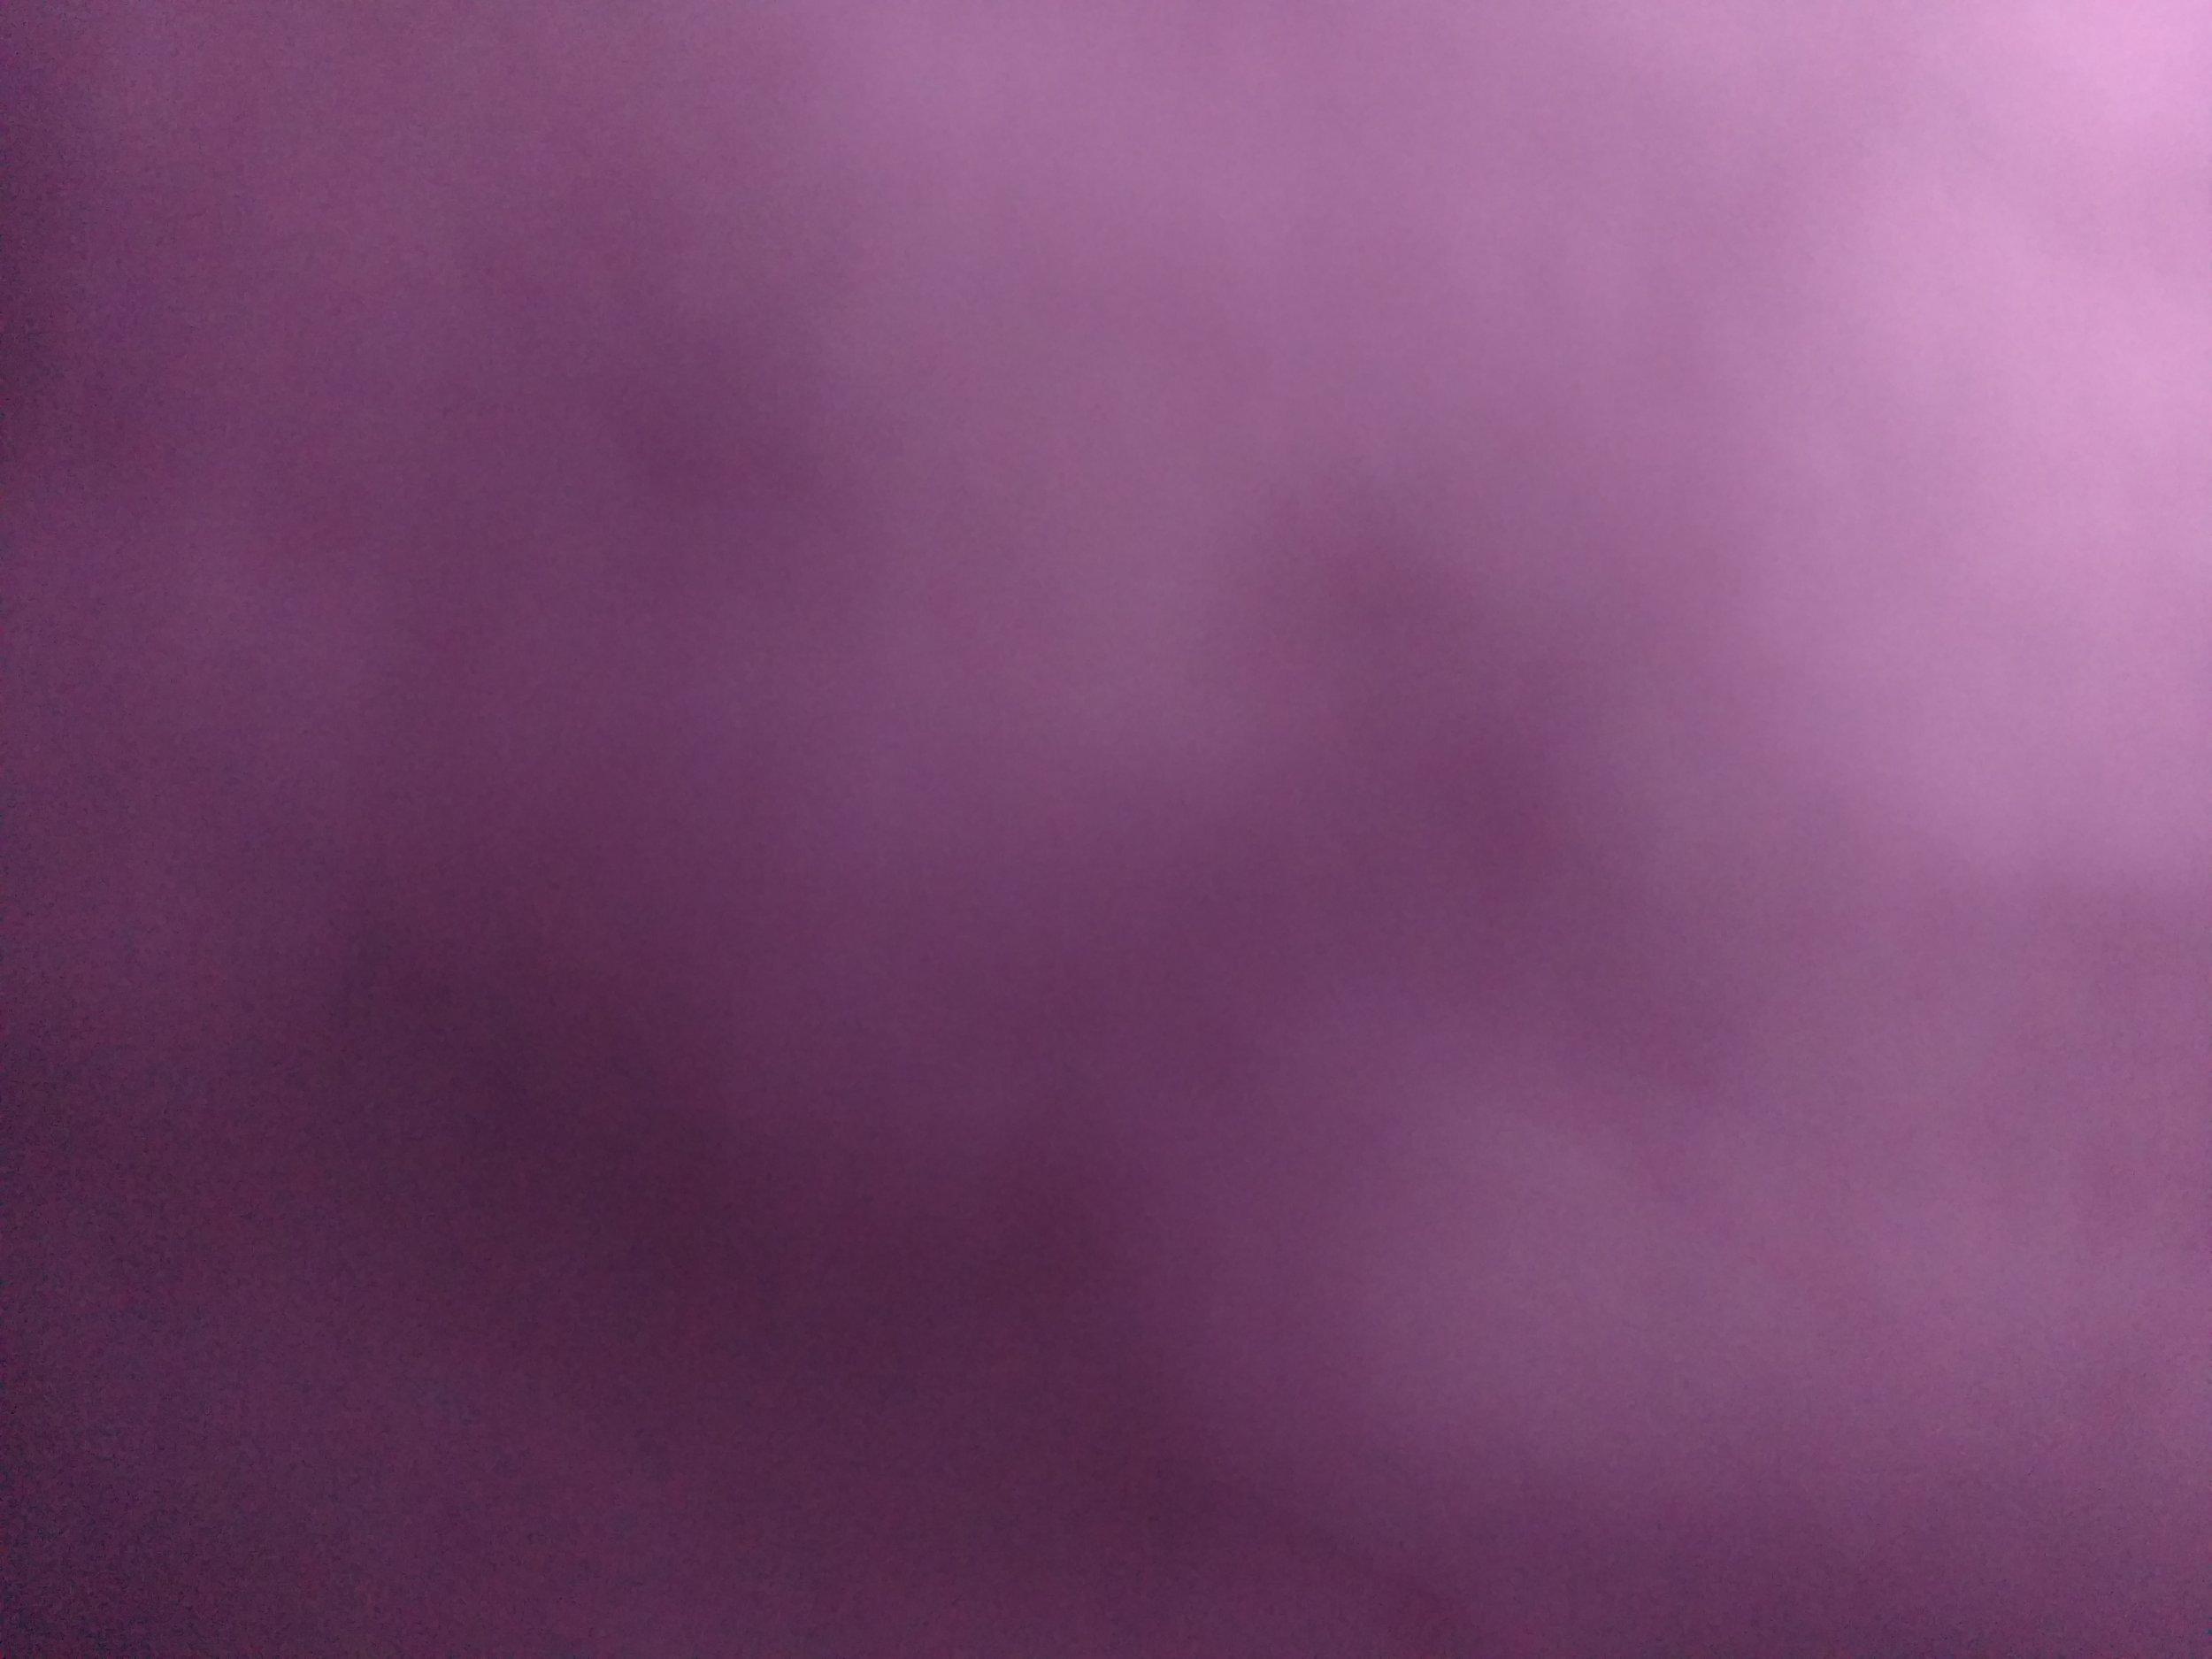 willroth-co-free-texture-gradient-086.jpg